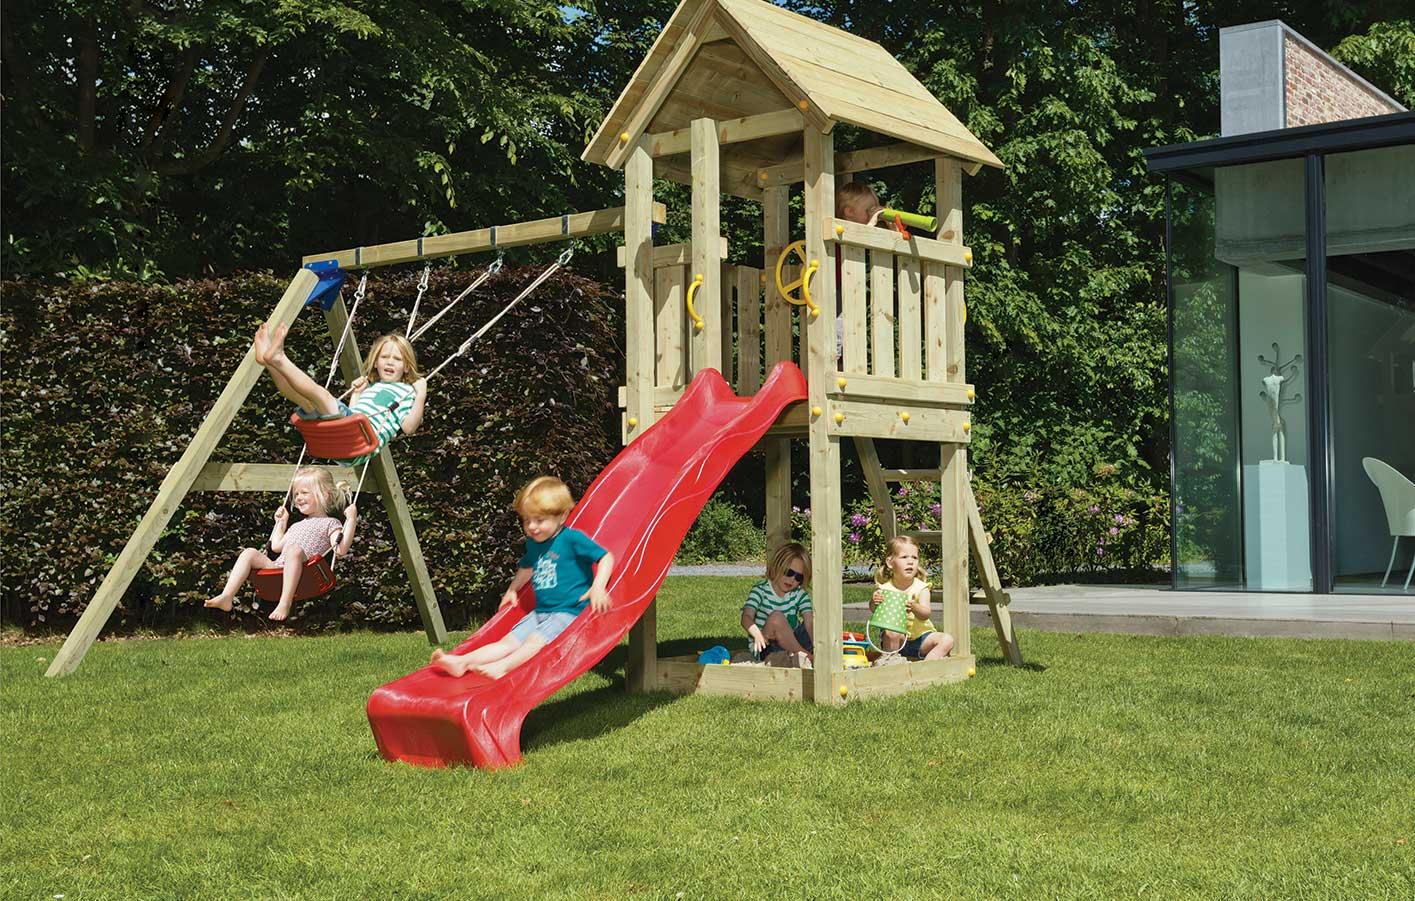 Klettergerüst Outdoor Holz : Spielgeräte spielturm holzschaukel ingolstadt altmühltal eichstätt